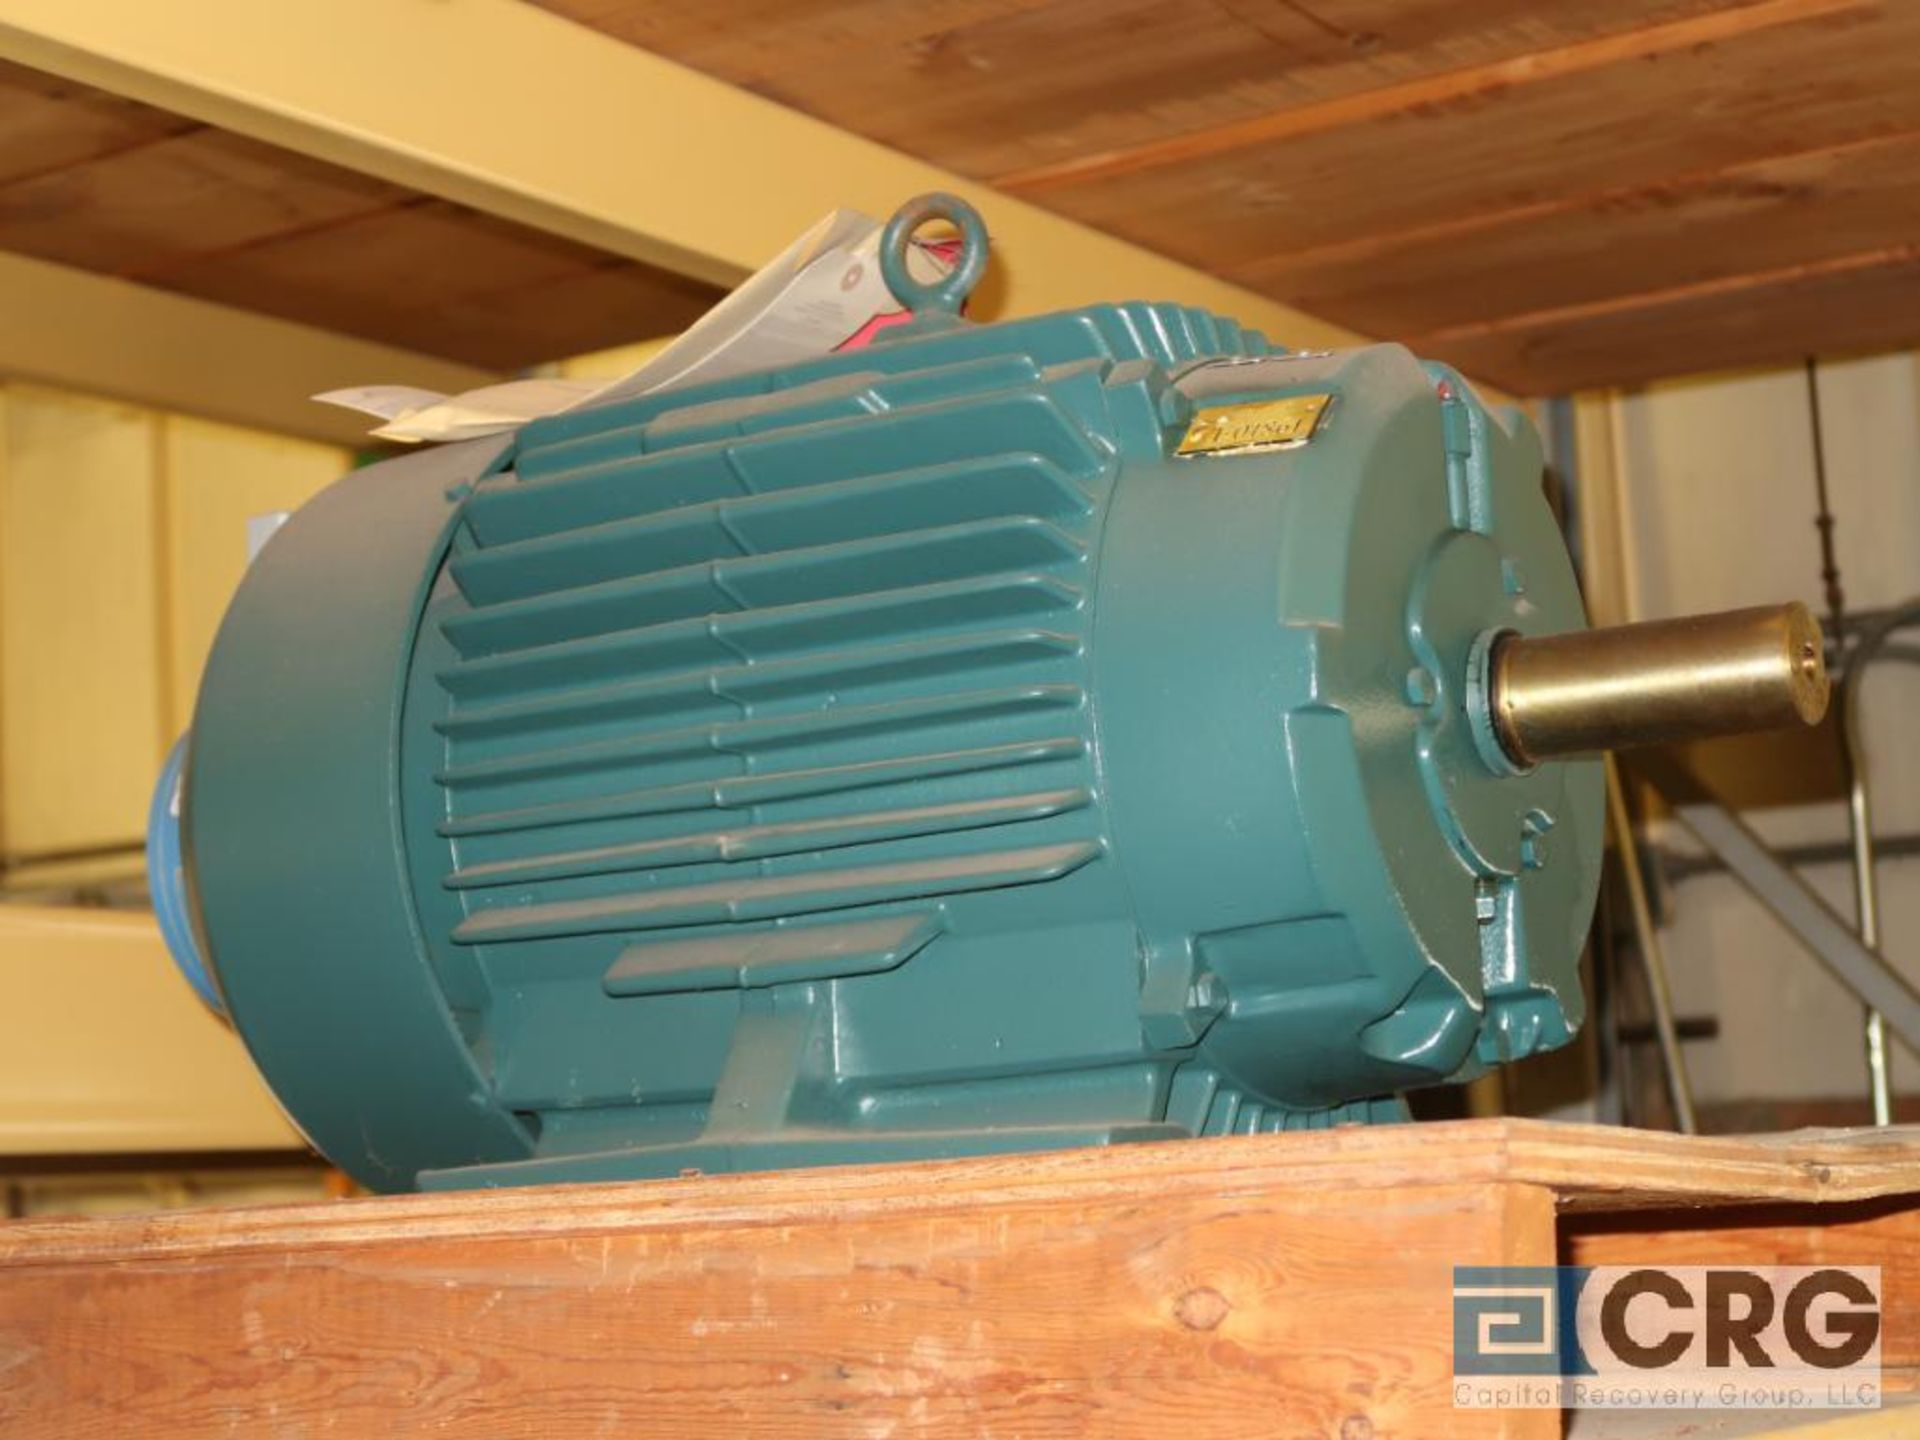 Lot of (5) assorted 25 HP motors on (2) shelves (Motor Building) - Image 3 of 3